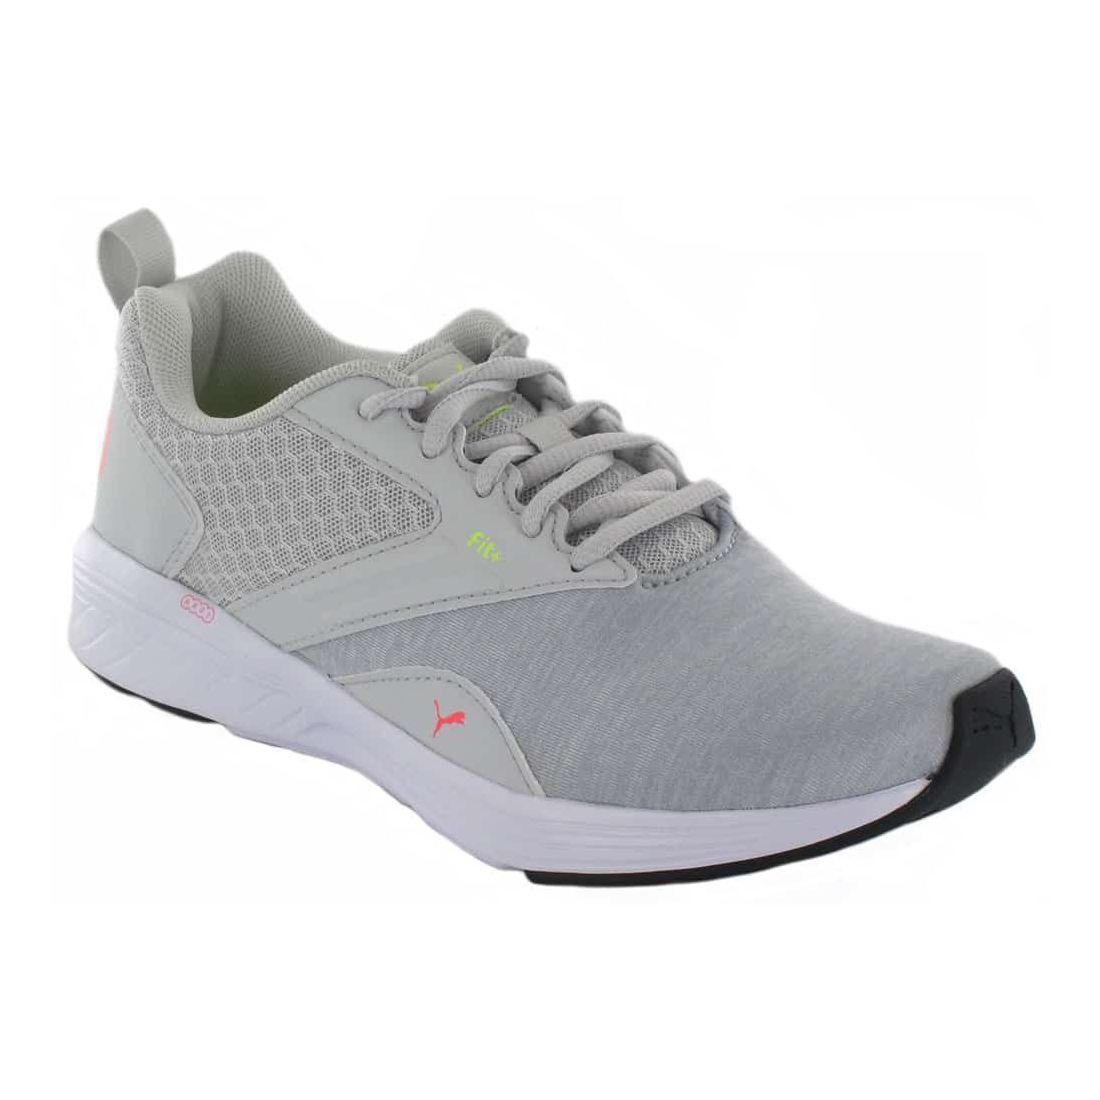 chaussure puma nrgy